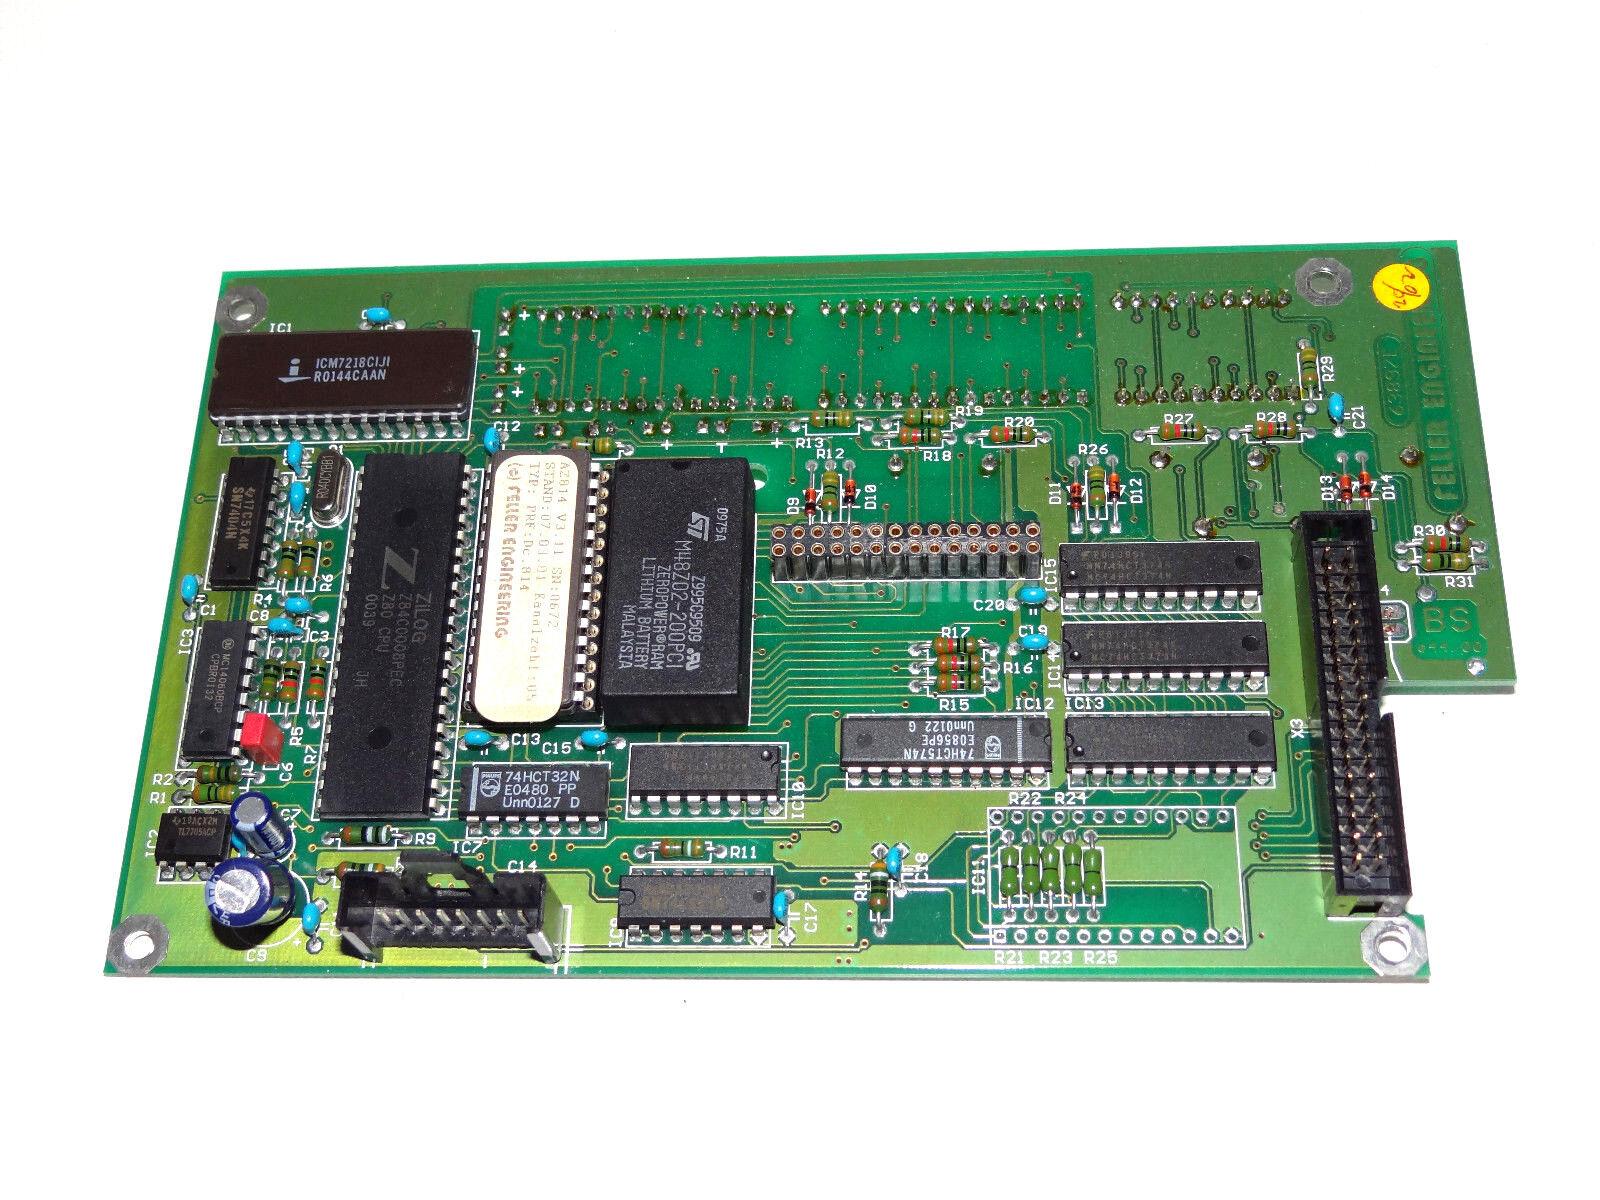 BROWN-BOVERI 07YS80 07YS80//GJR5212100R1 Modul Eingänge Ausgänge Used